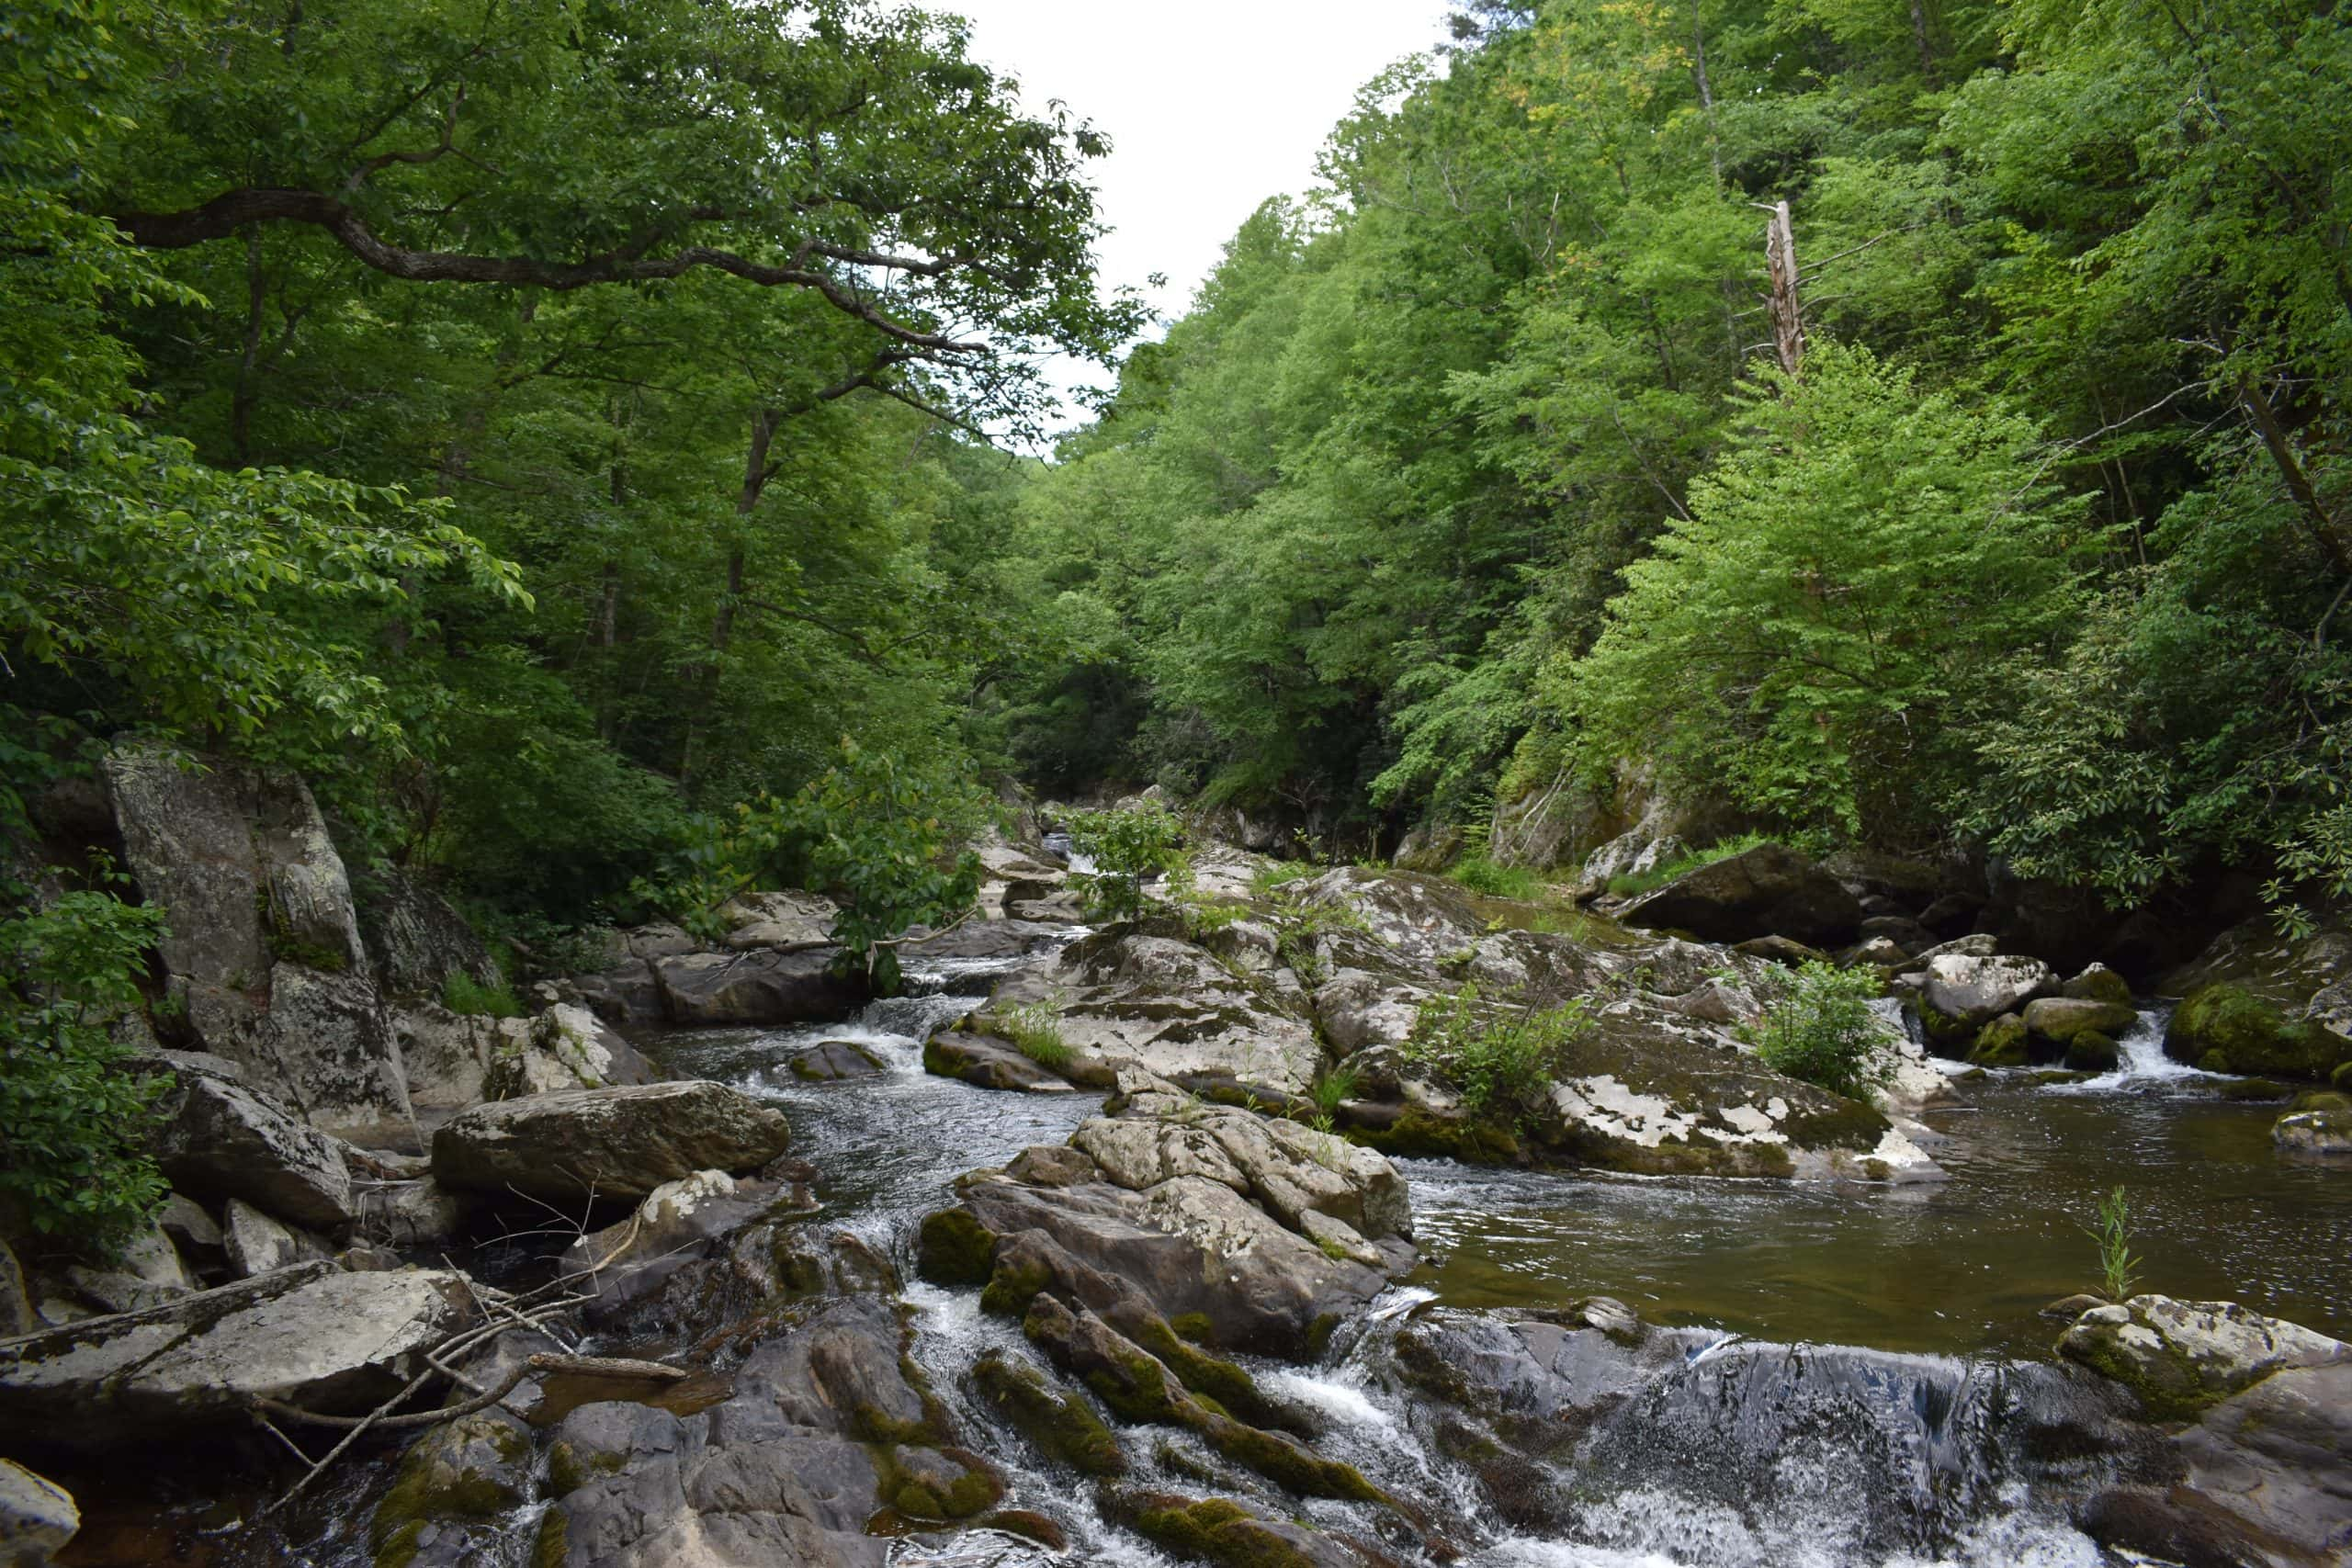 Hikes Around Roanoke  - Bottom Creek Gorge